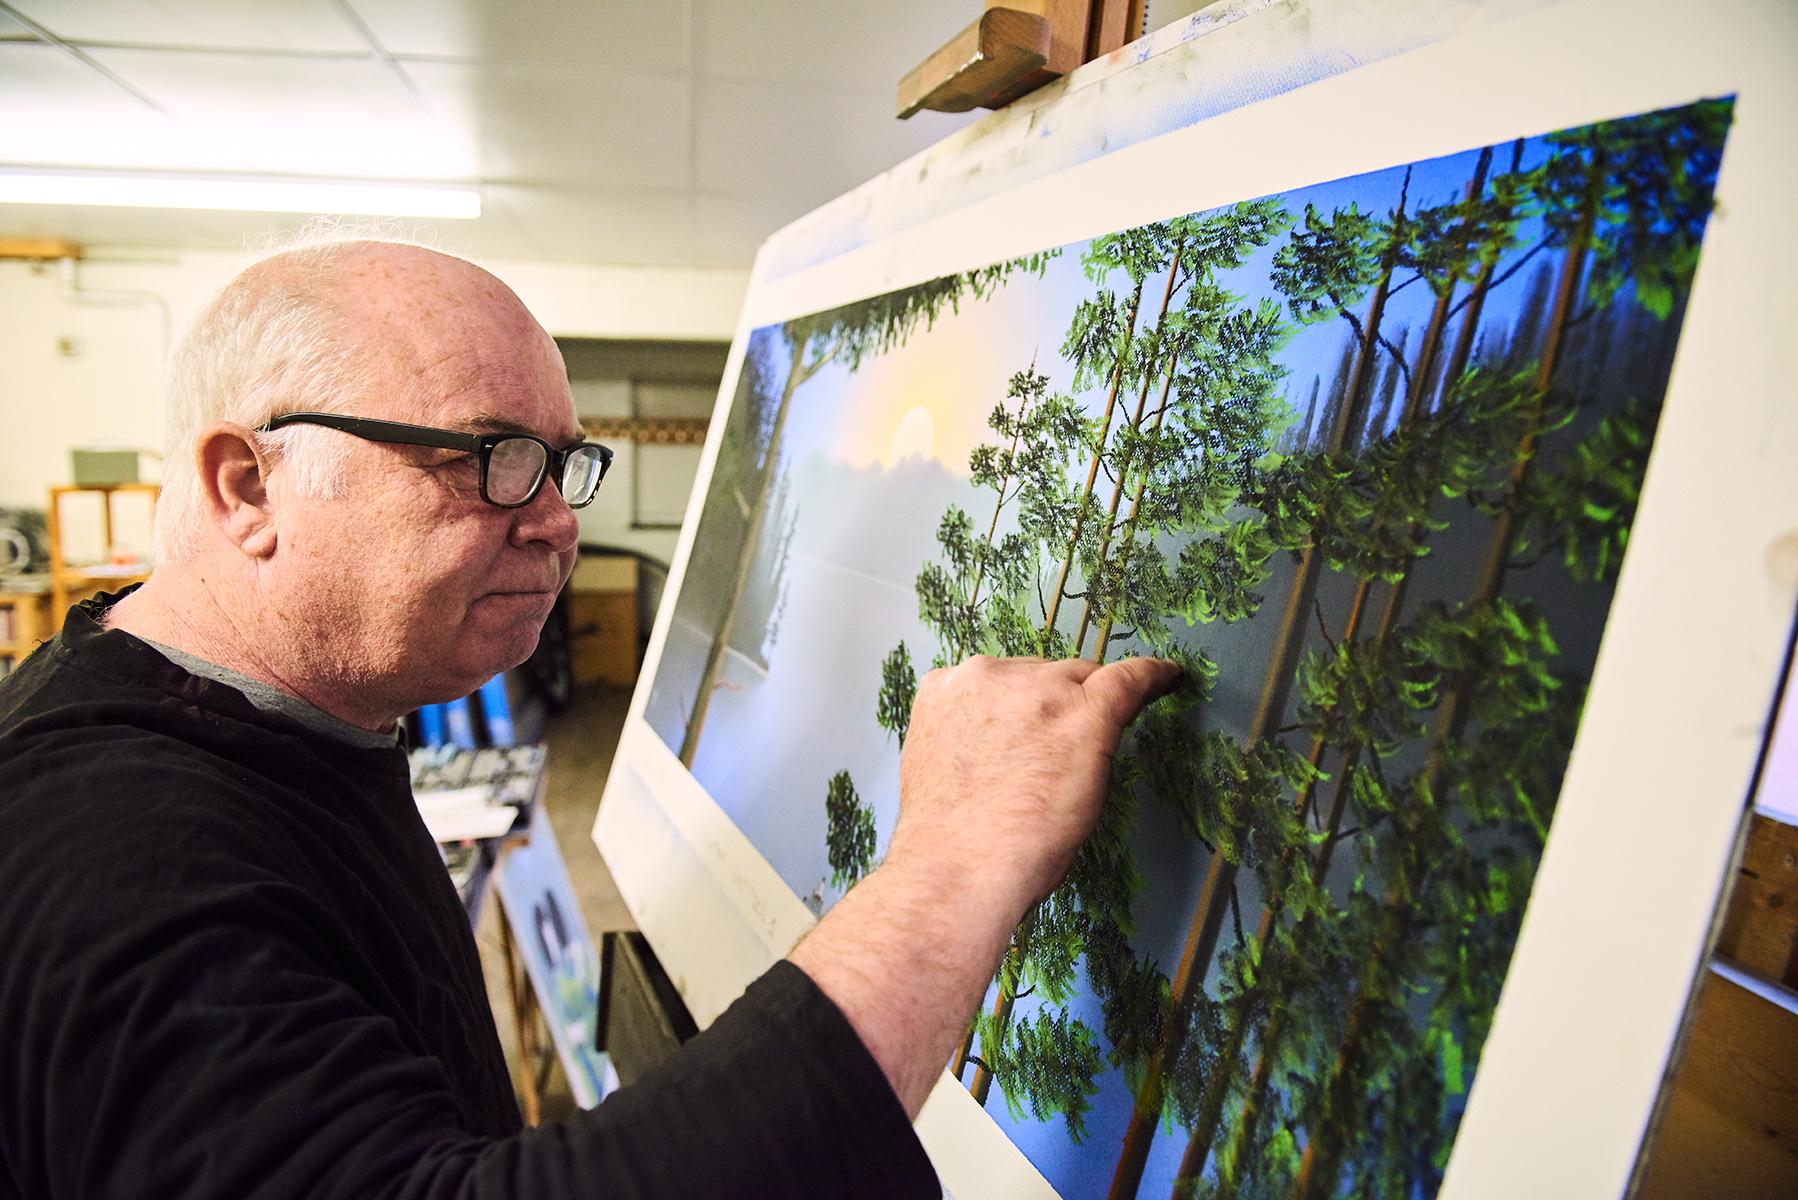 Artist Mackenzie Thorpe working on landscape painting close up